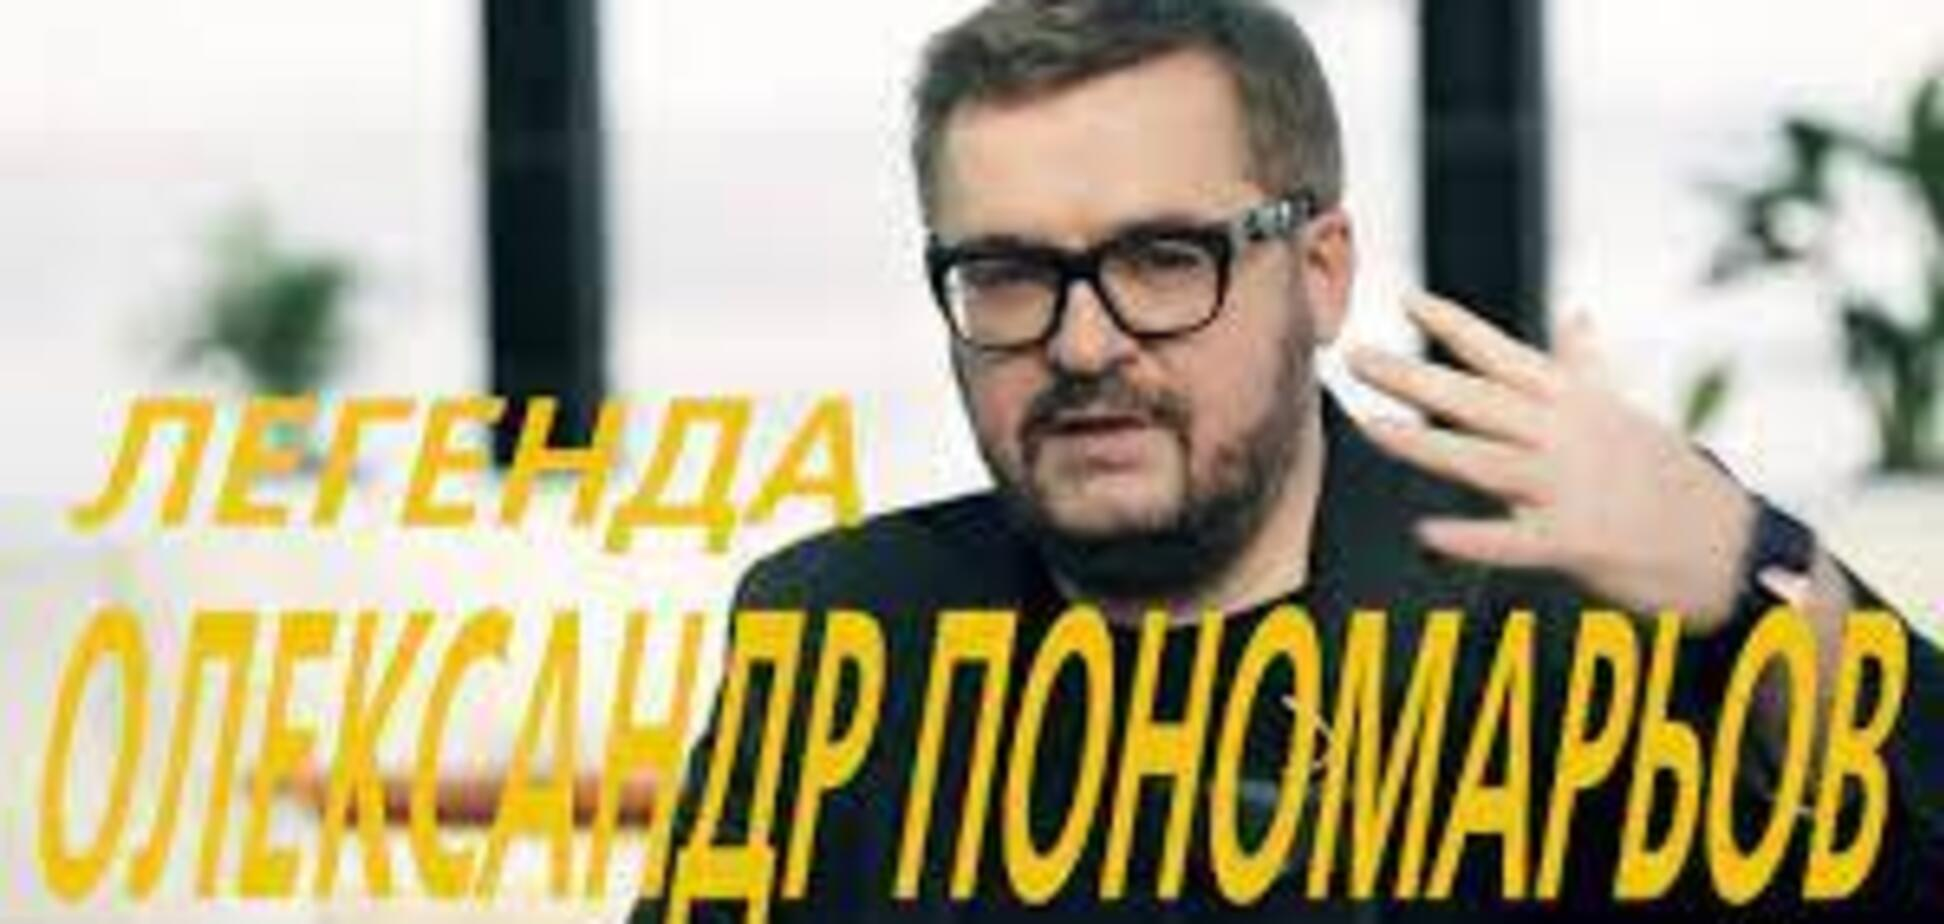 Легенда | Александр Пономарев